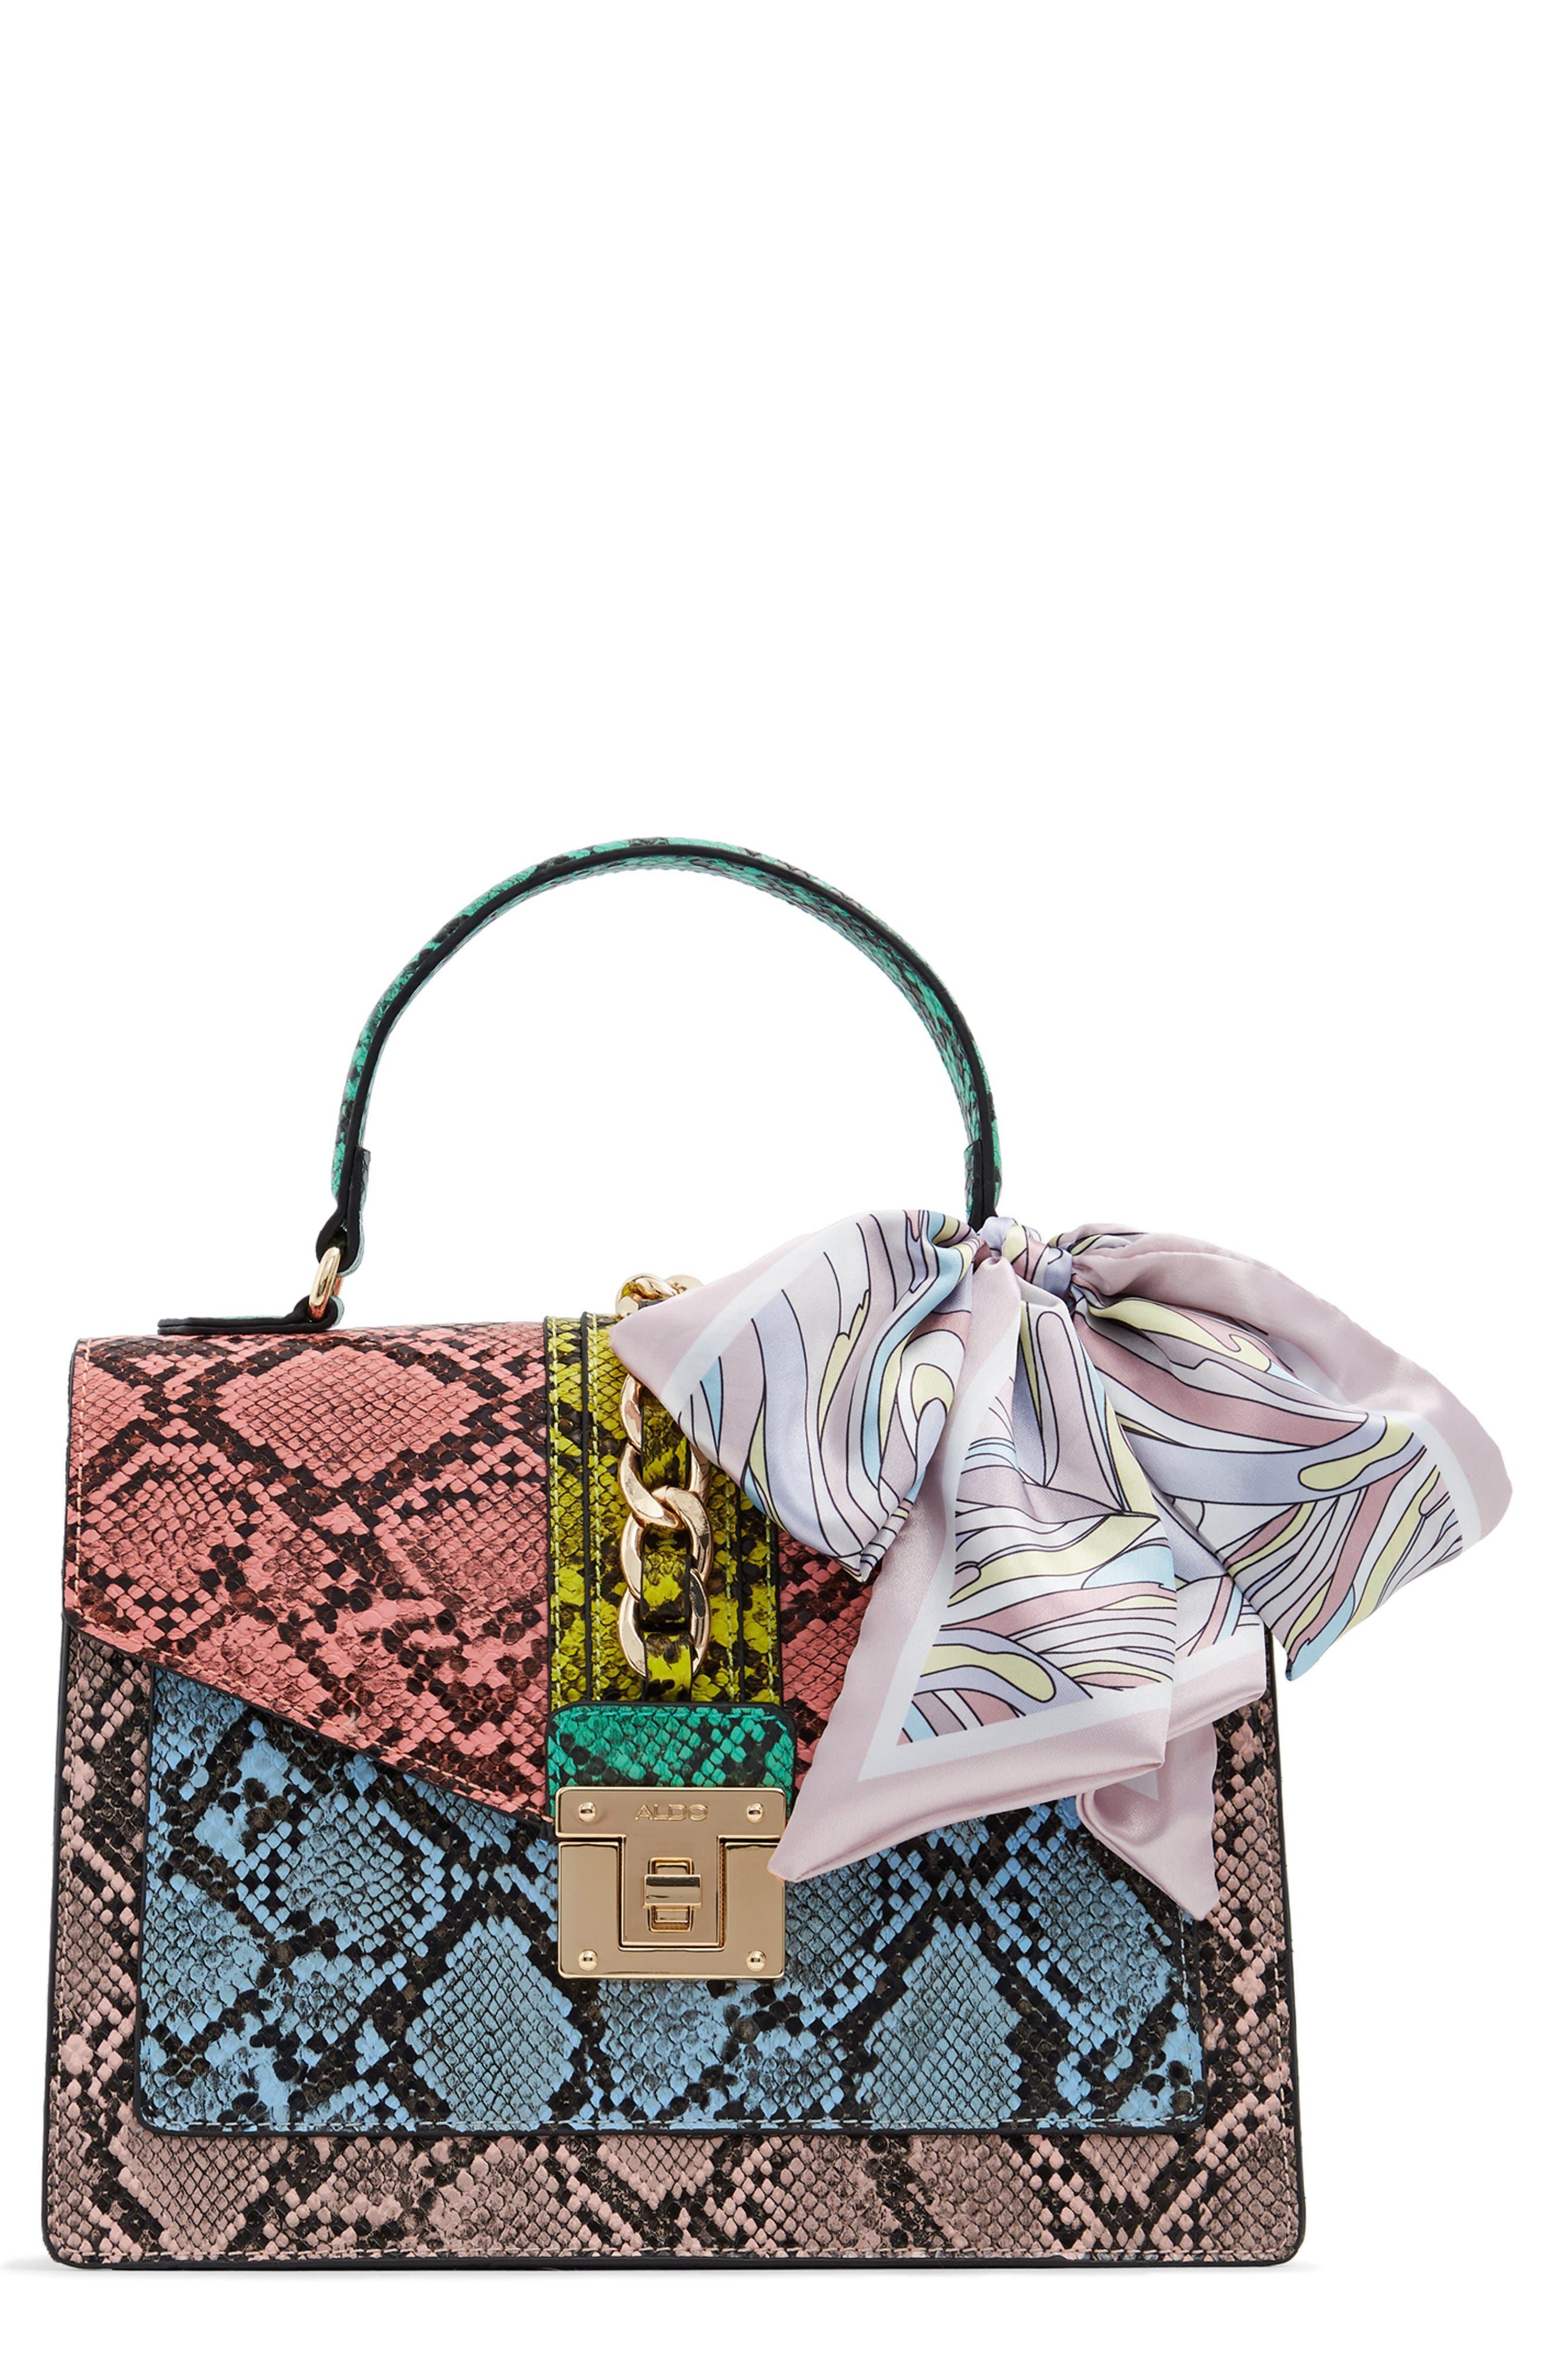 Glendaa Colorblock Snake Print Handbag